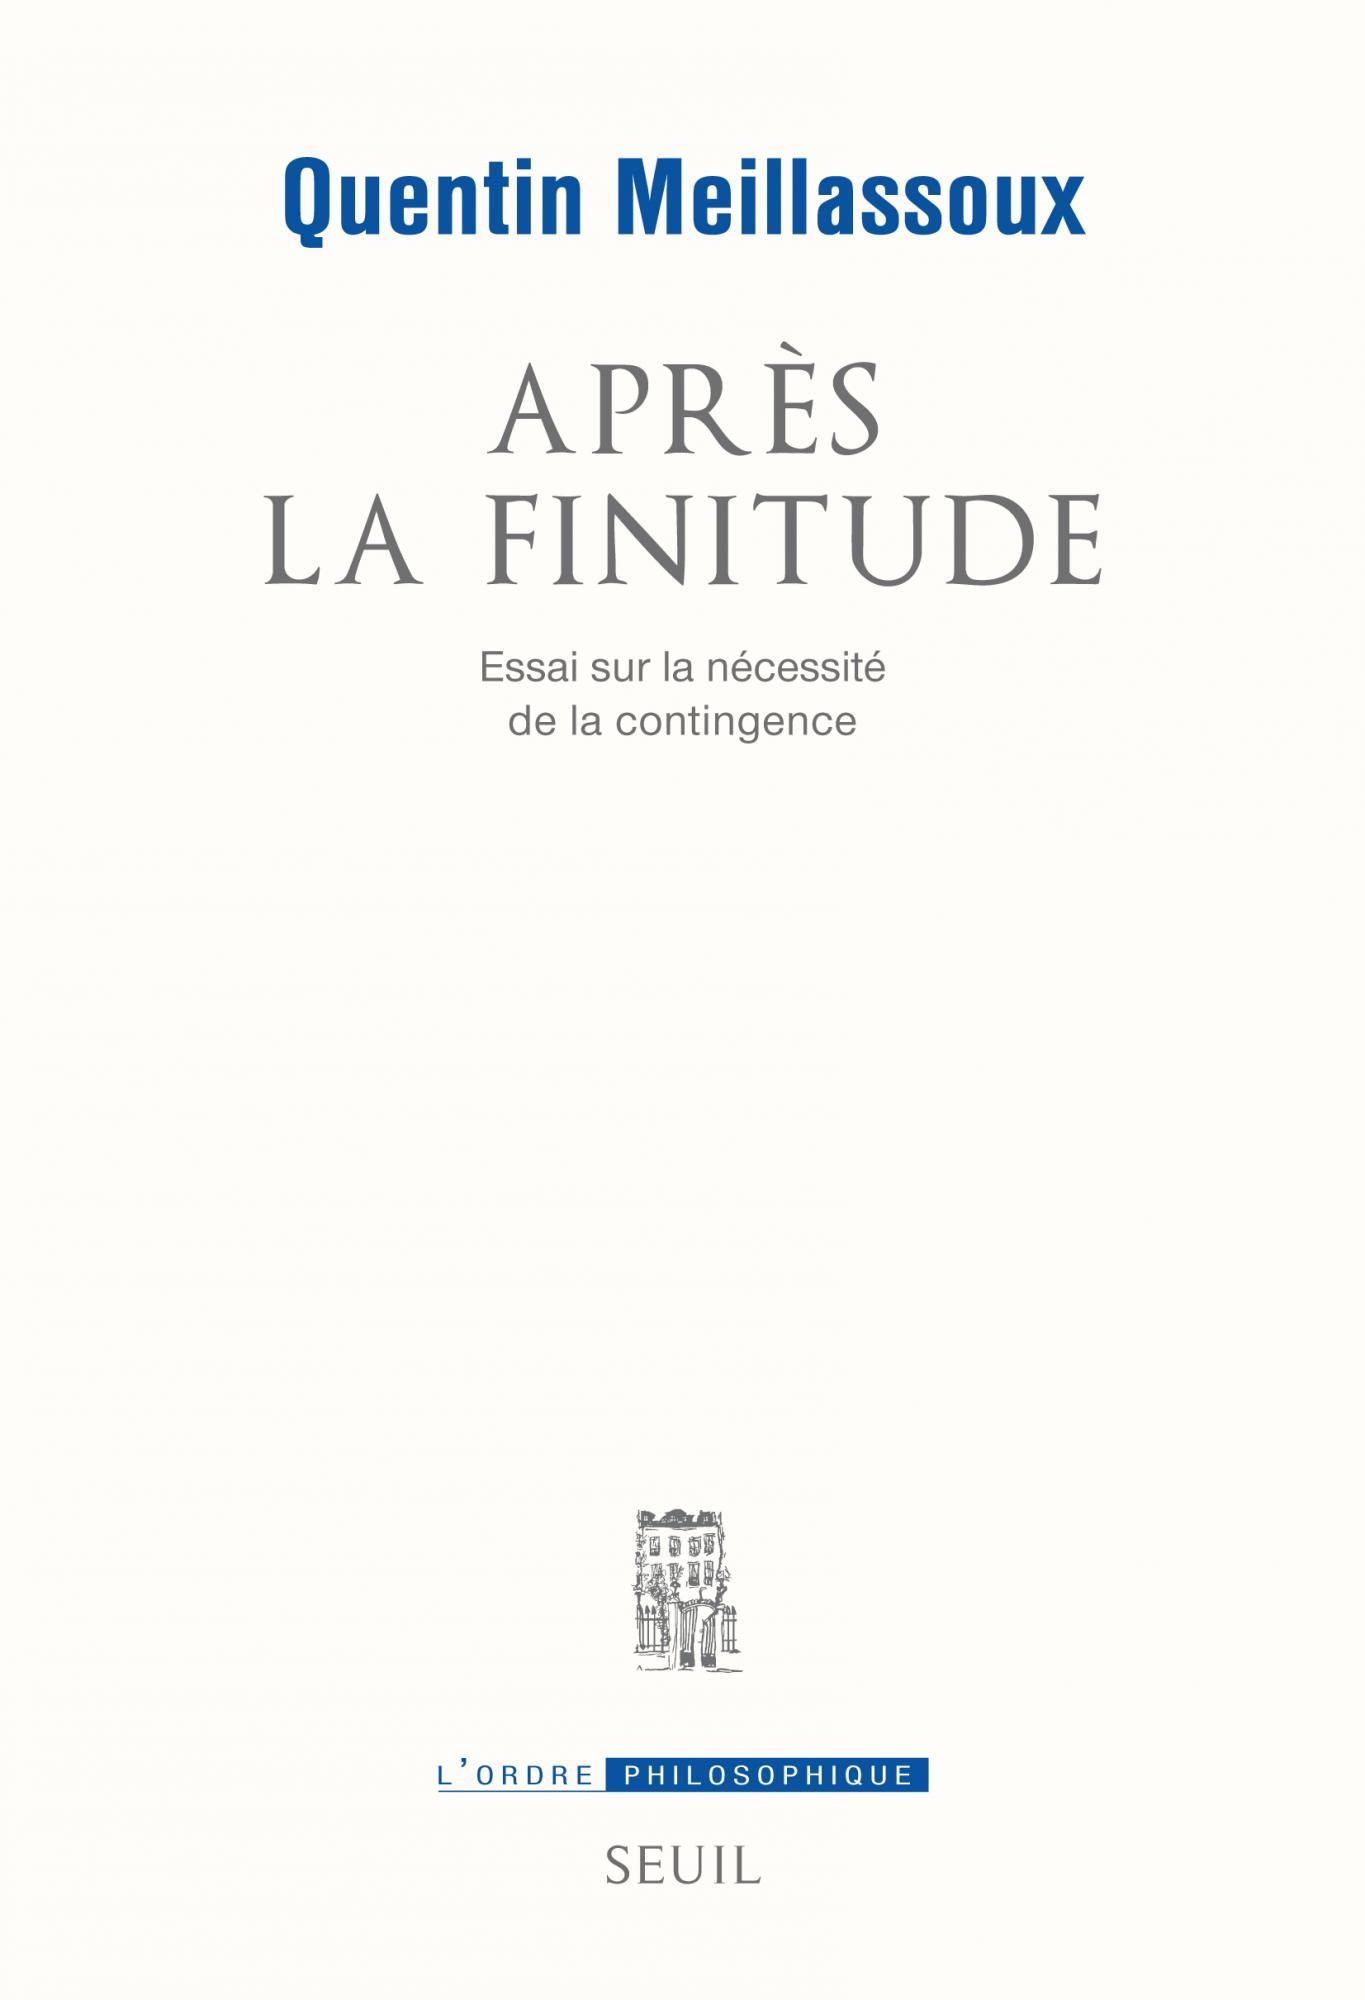 meillassoux_apres_la_finitude_2.jpg